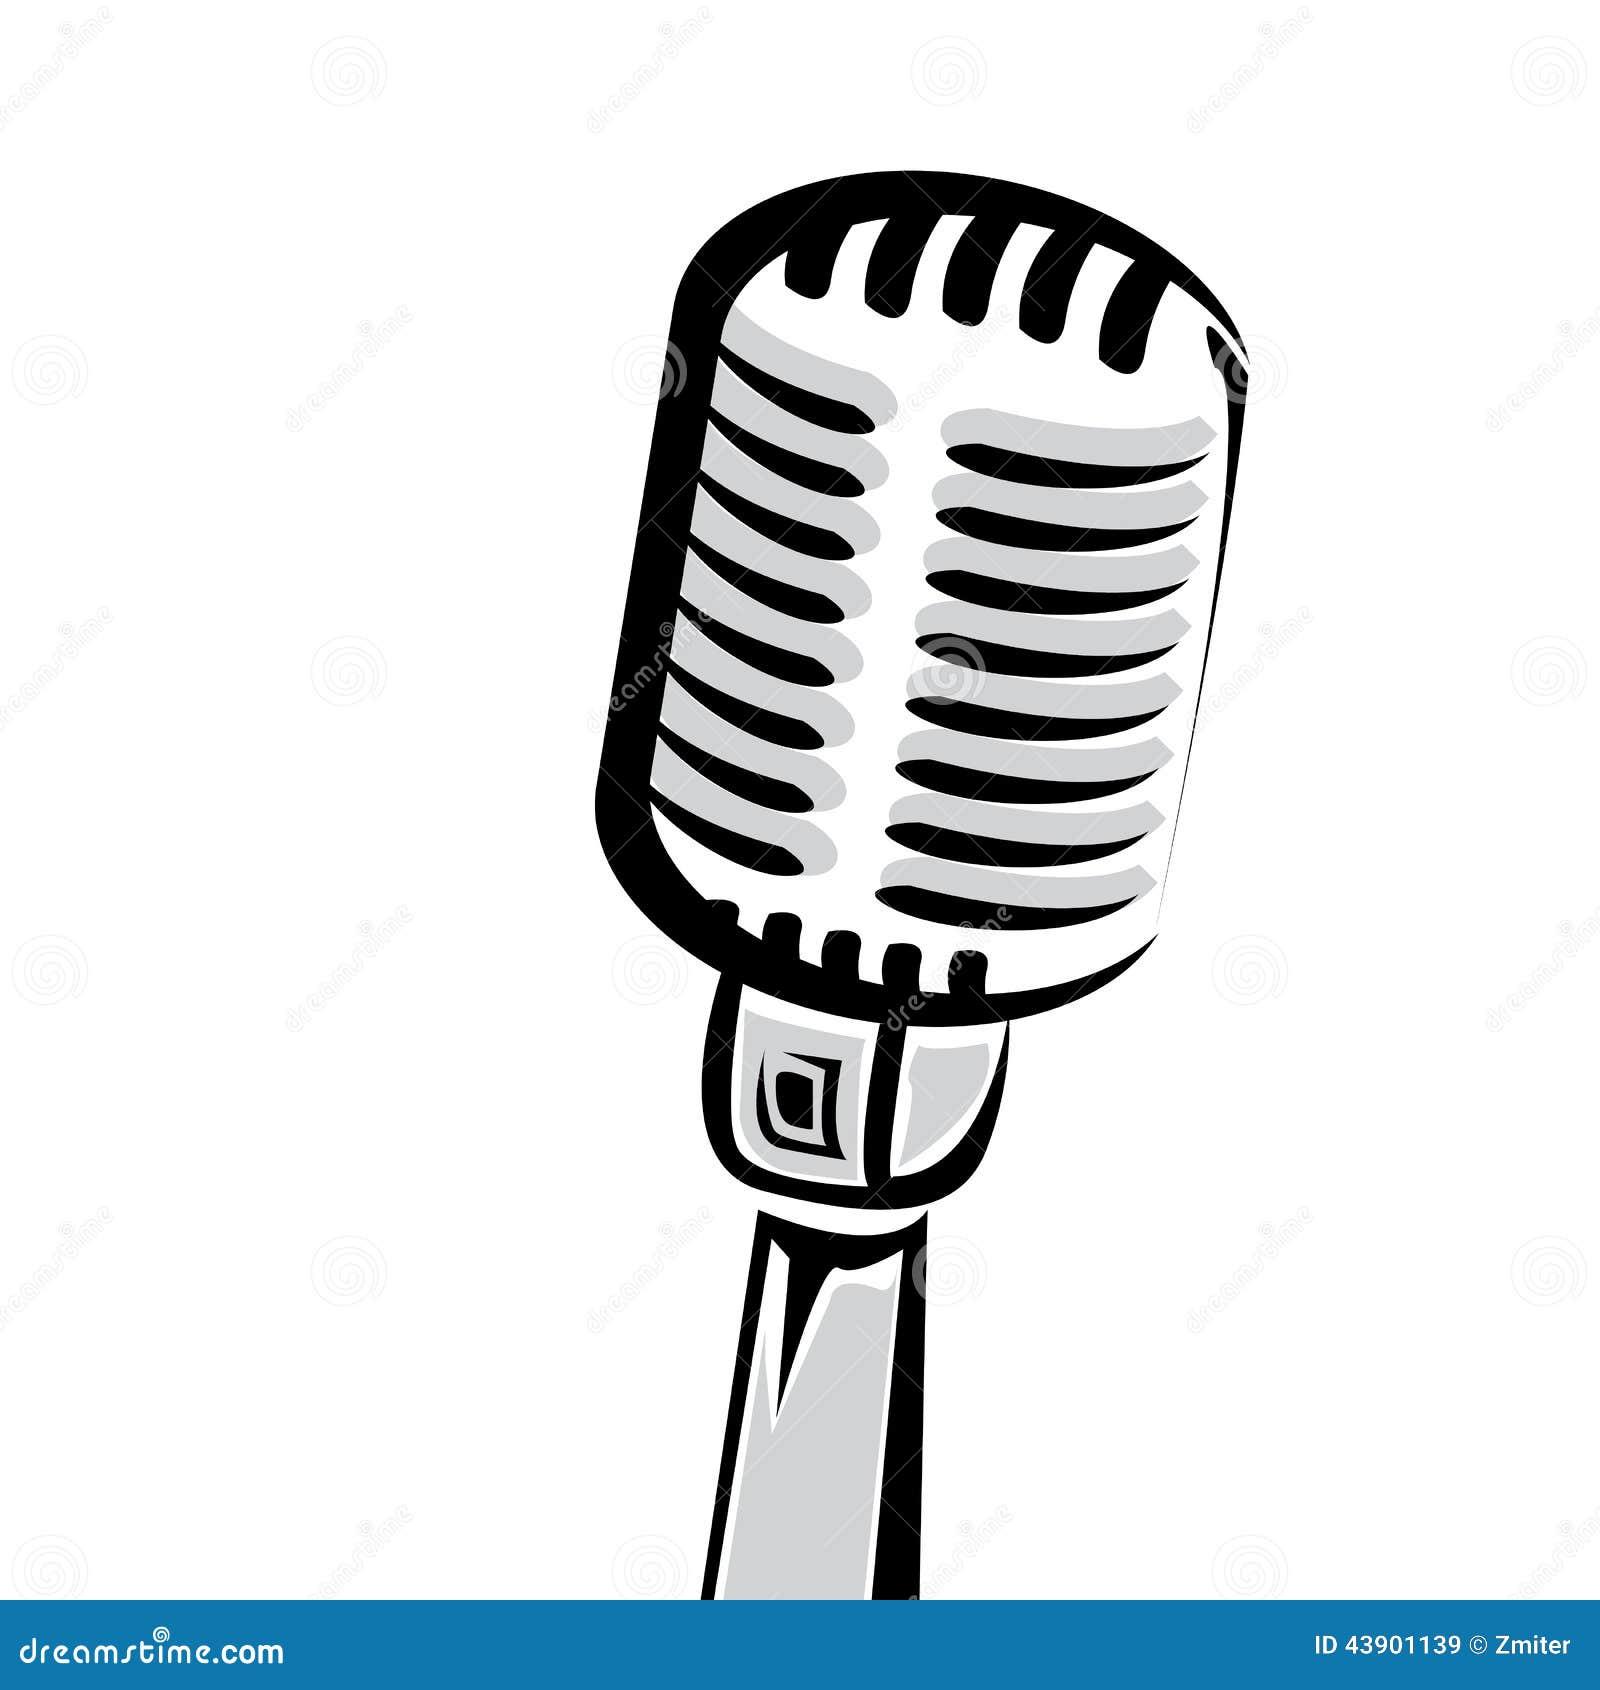 Retro Microphone Silhouette Vector Illustration Stock ...